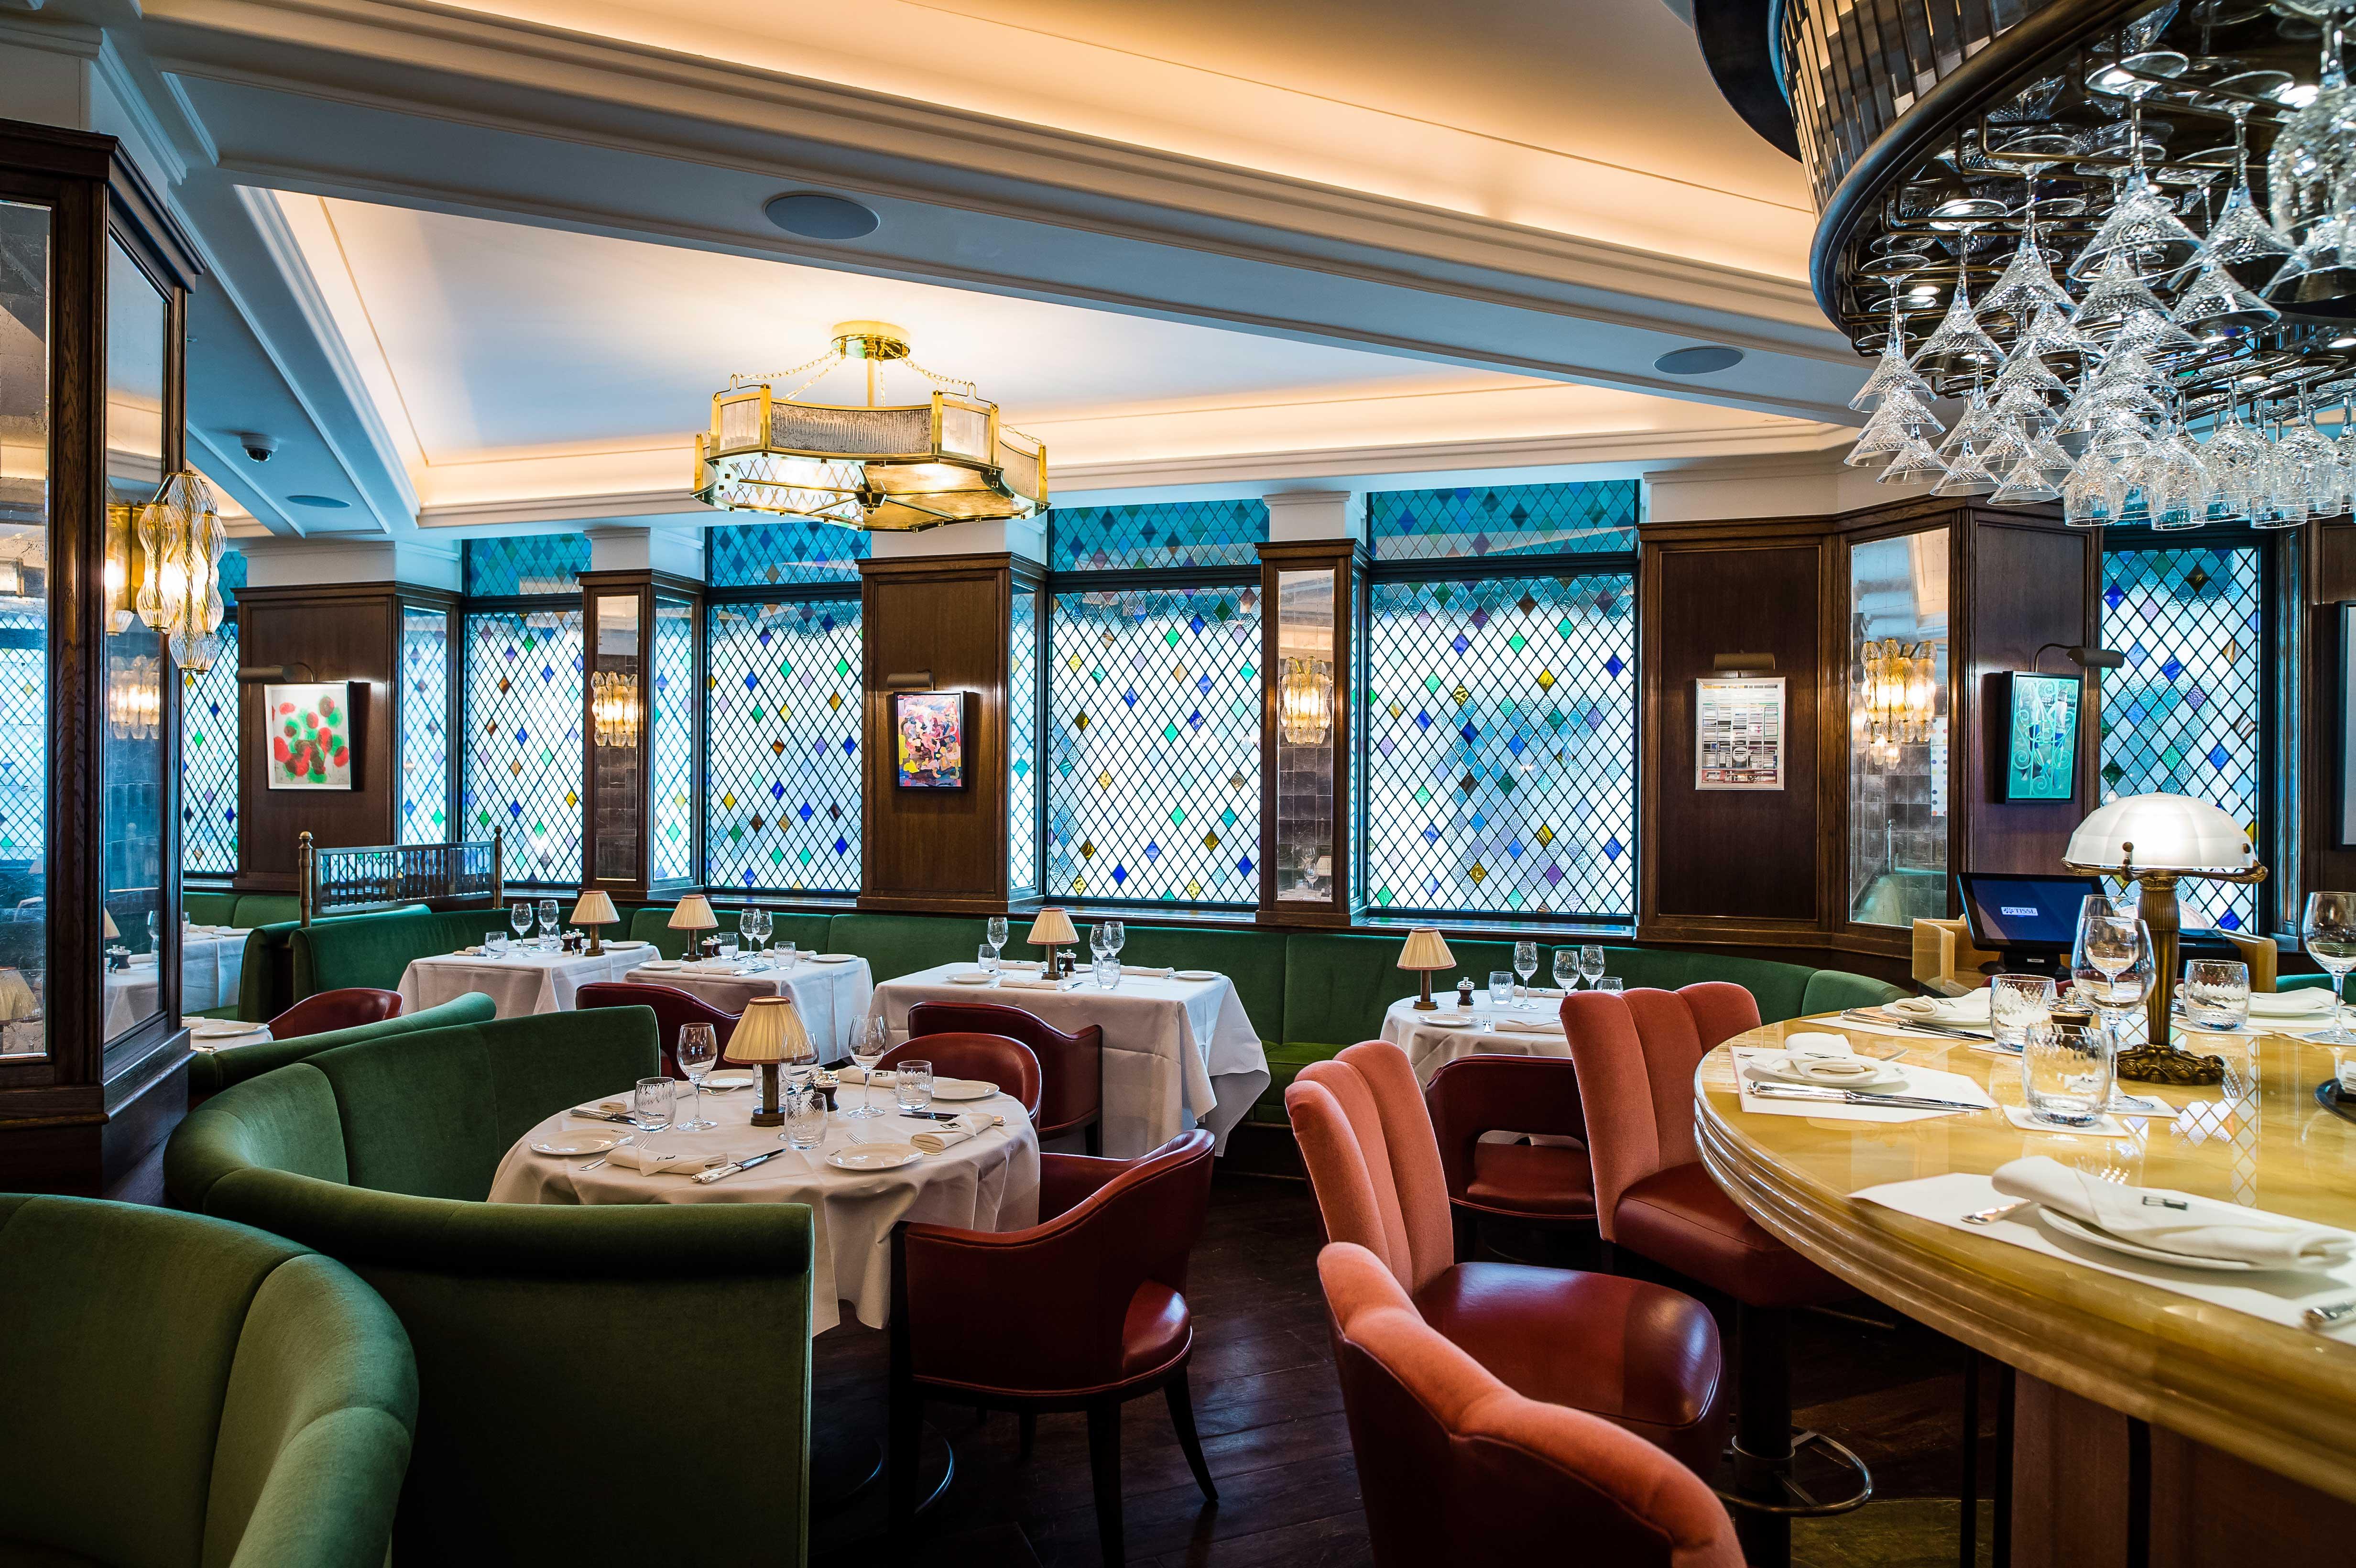 London Restaurant Interiors | Interiors Inspiration | London Design ...